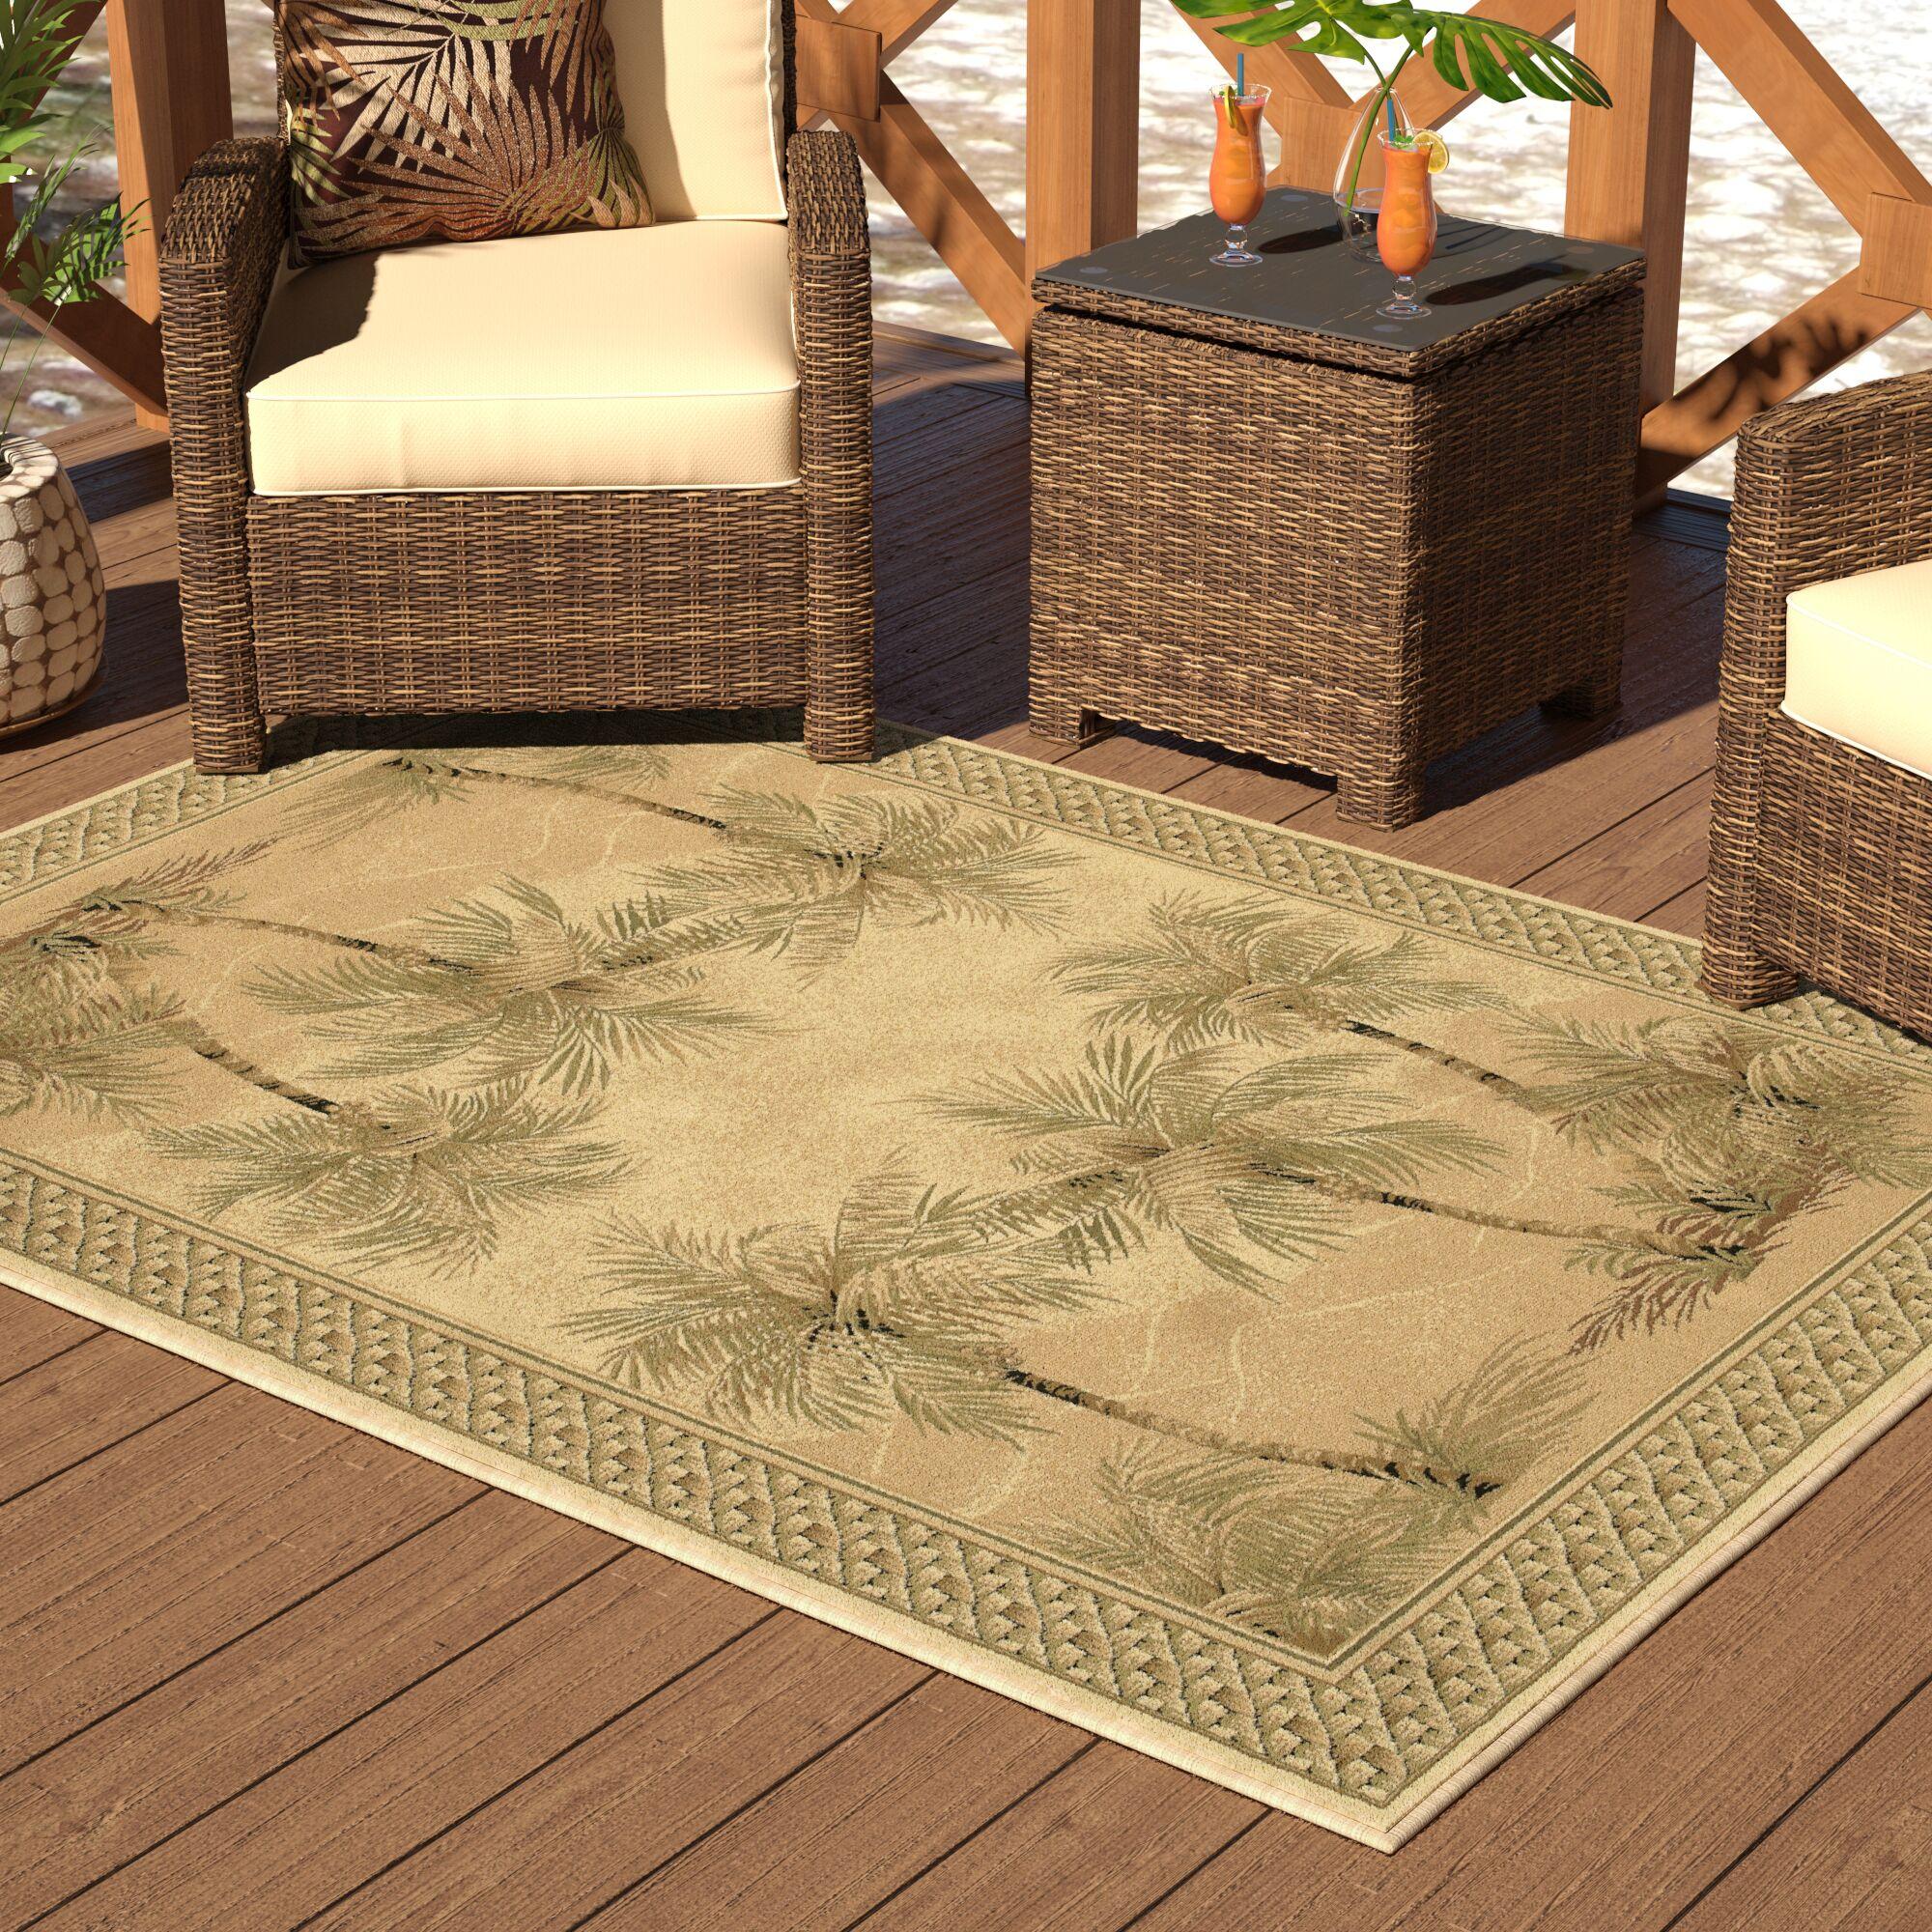 Alexandra Desert Sand Area Rug Rug Size: Rectangle 5'3